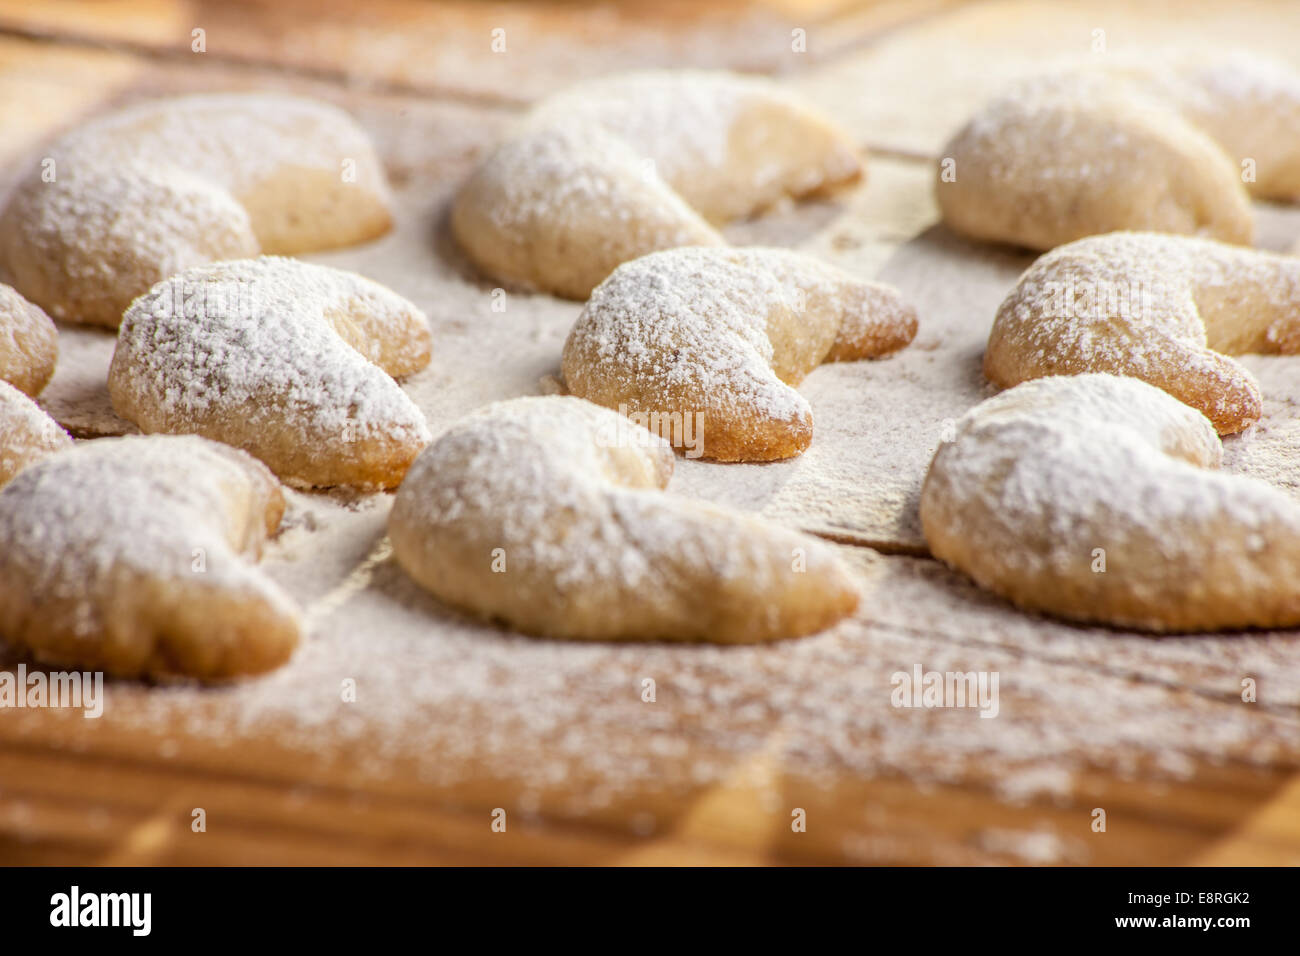 Christmas Cookies With Vanilla On Floured Table Stock Photo